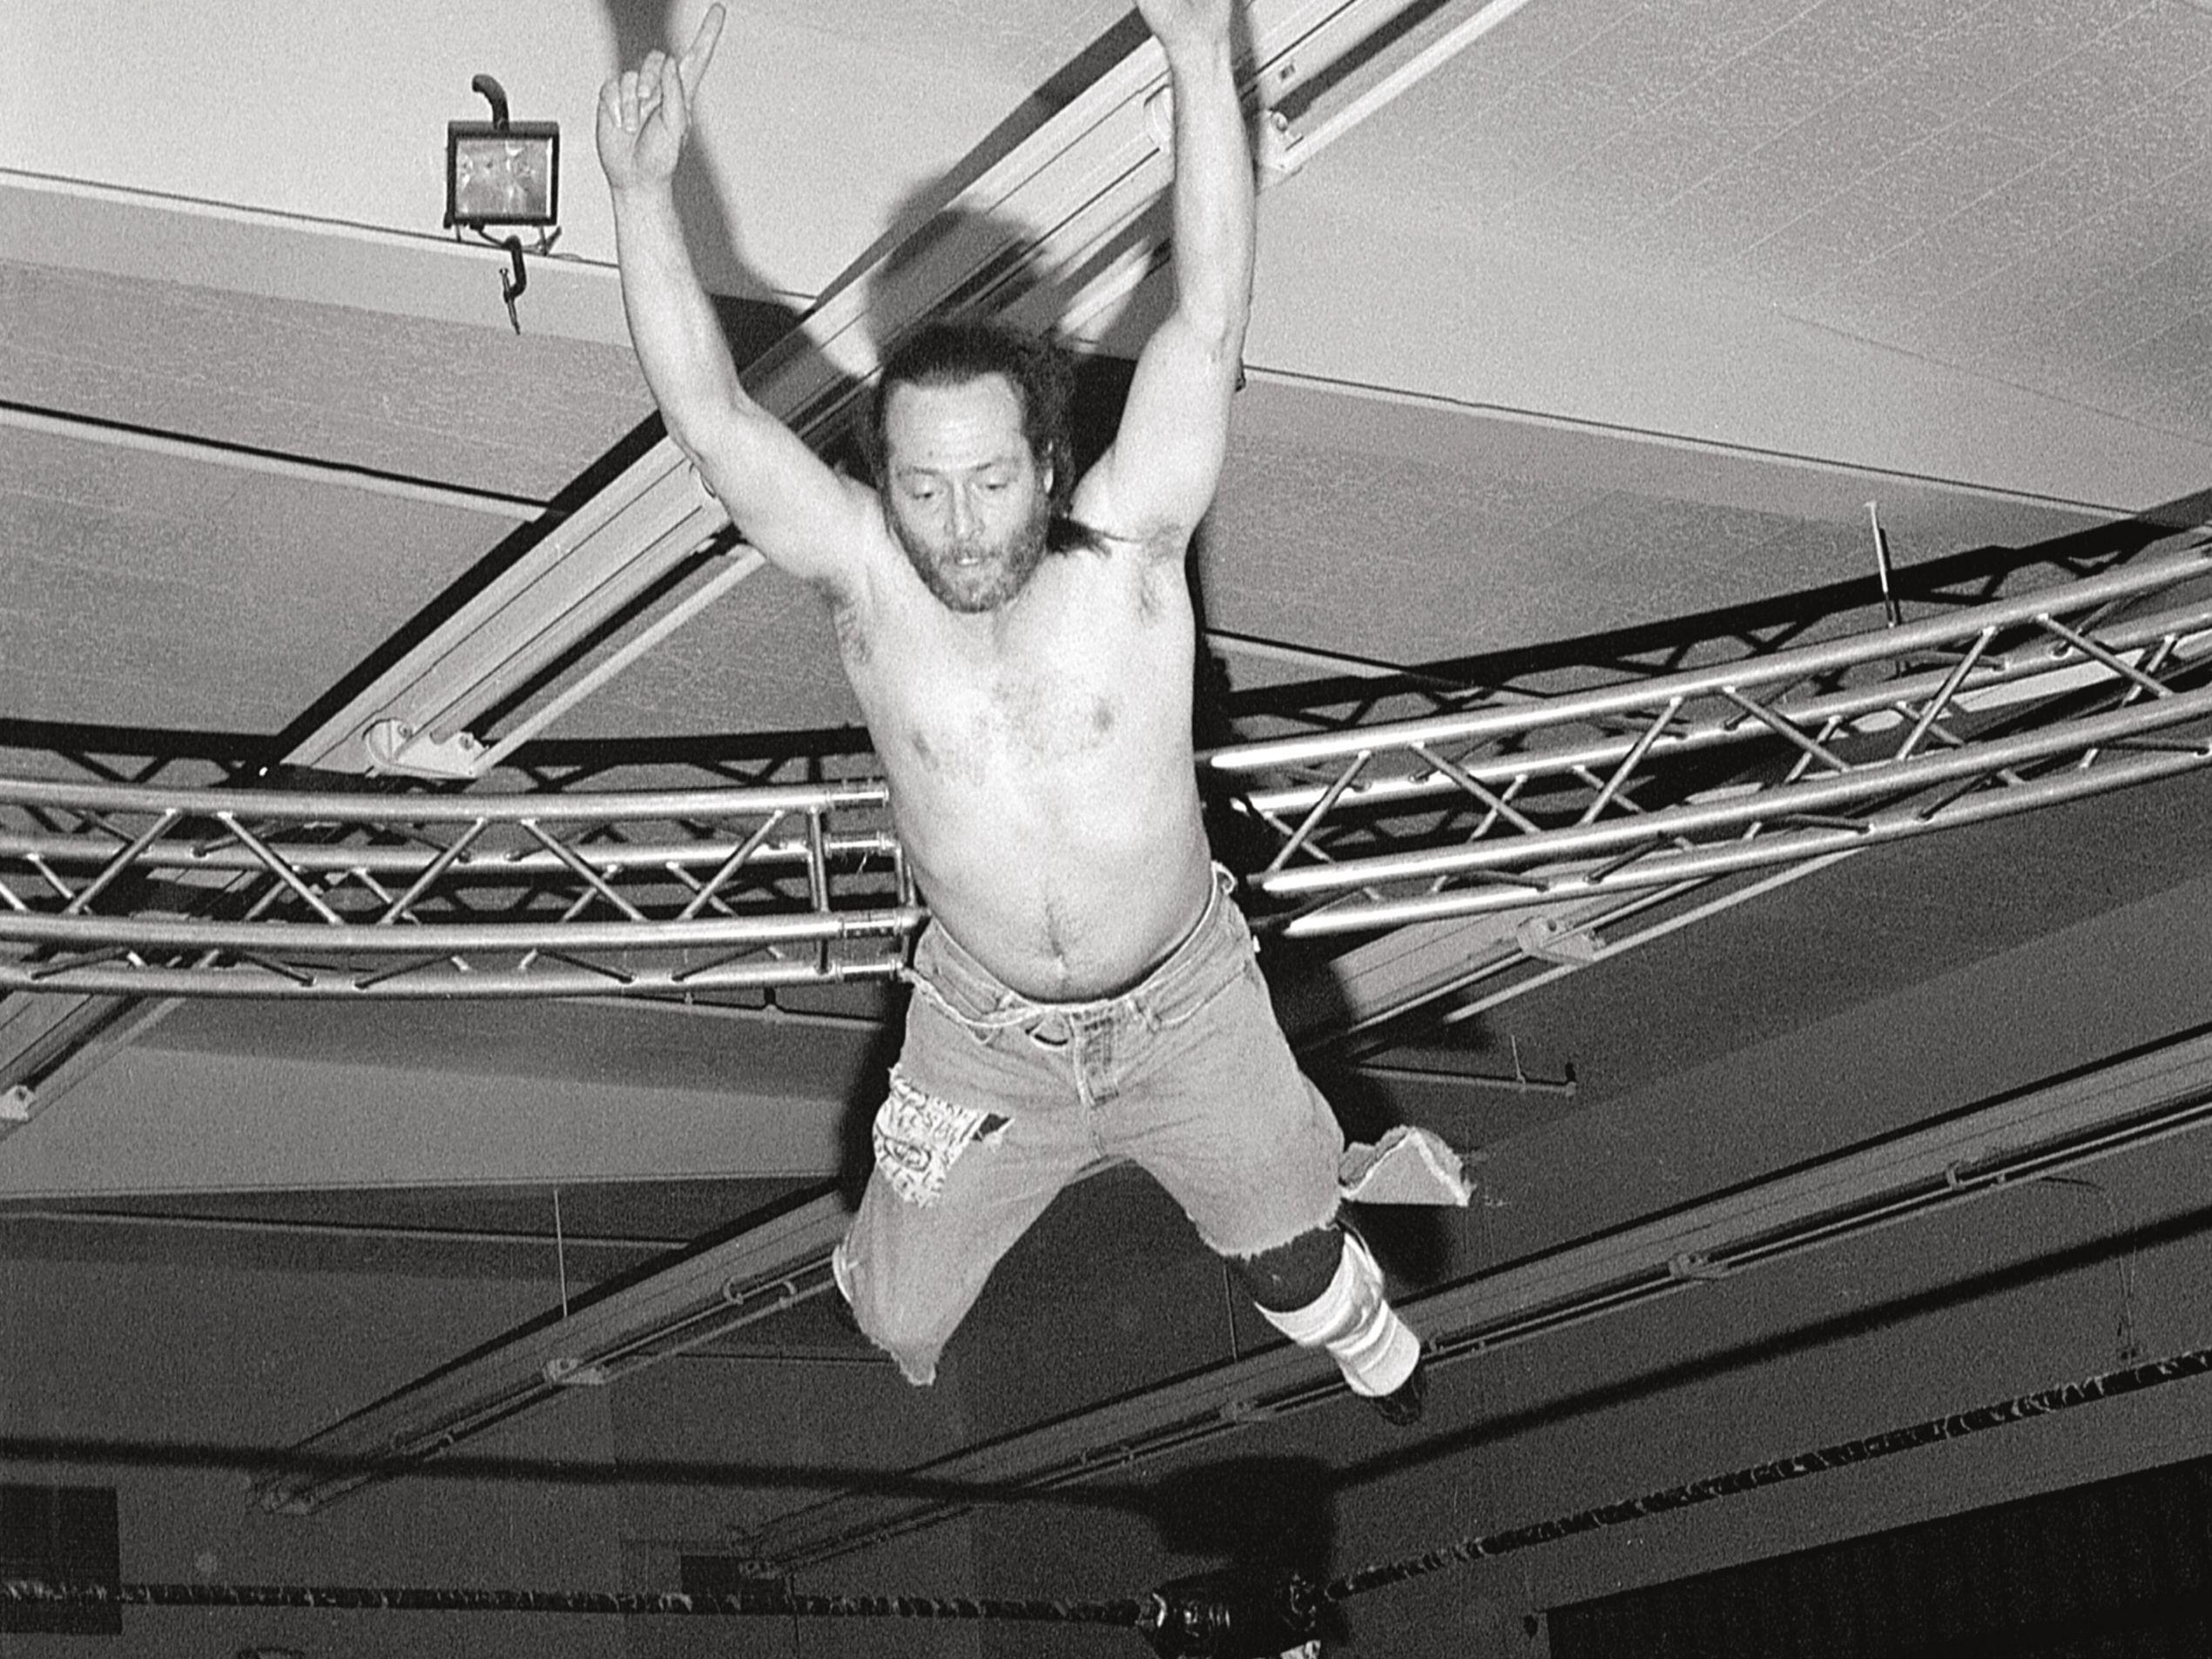 0118 wrestling opener collage zau3fg